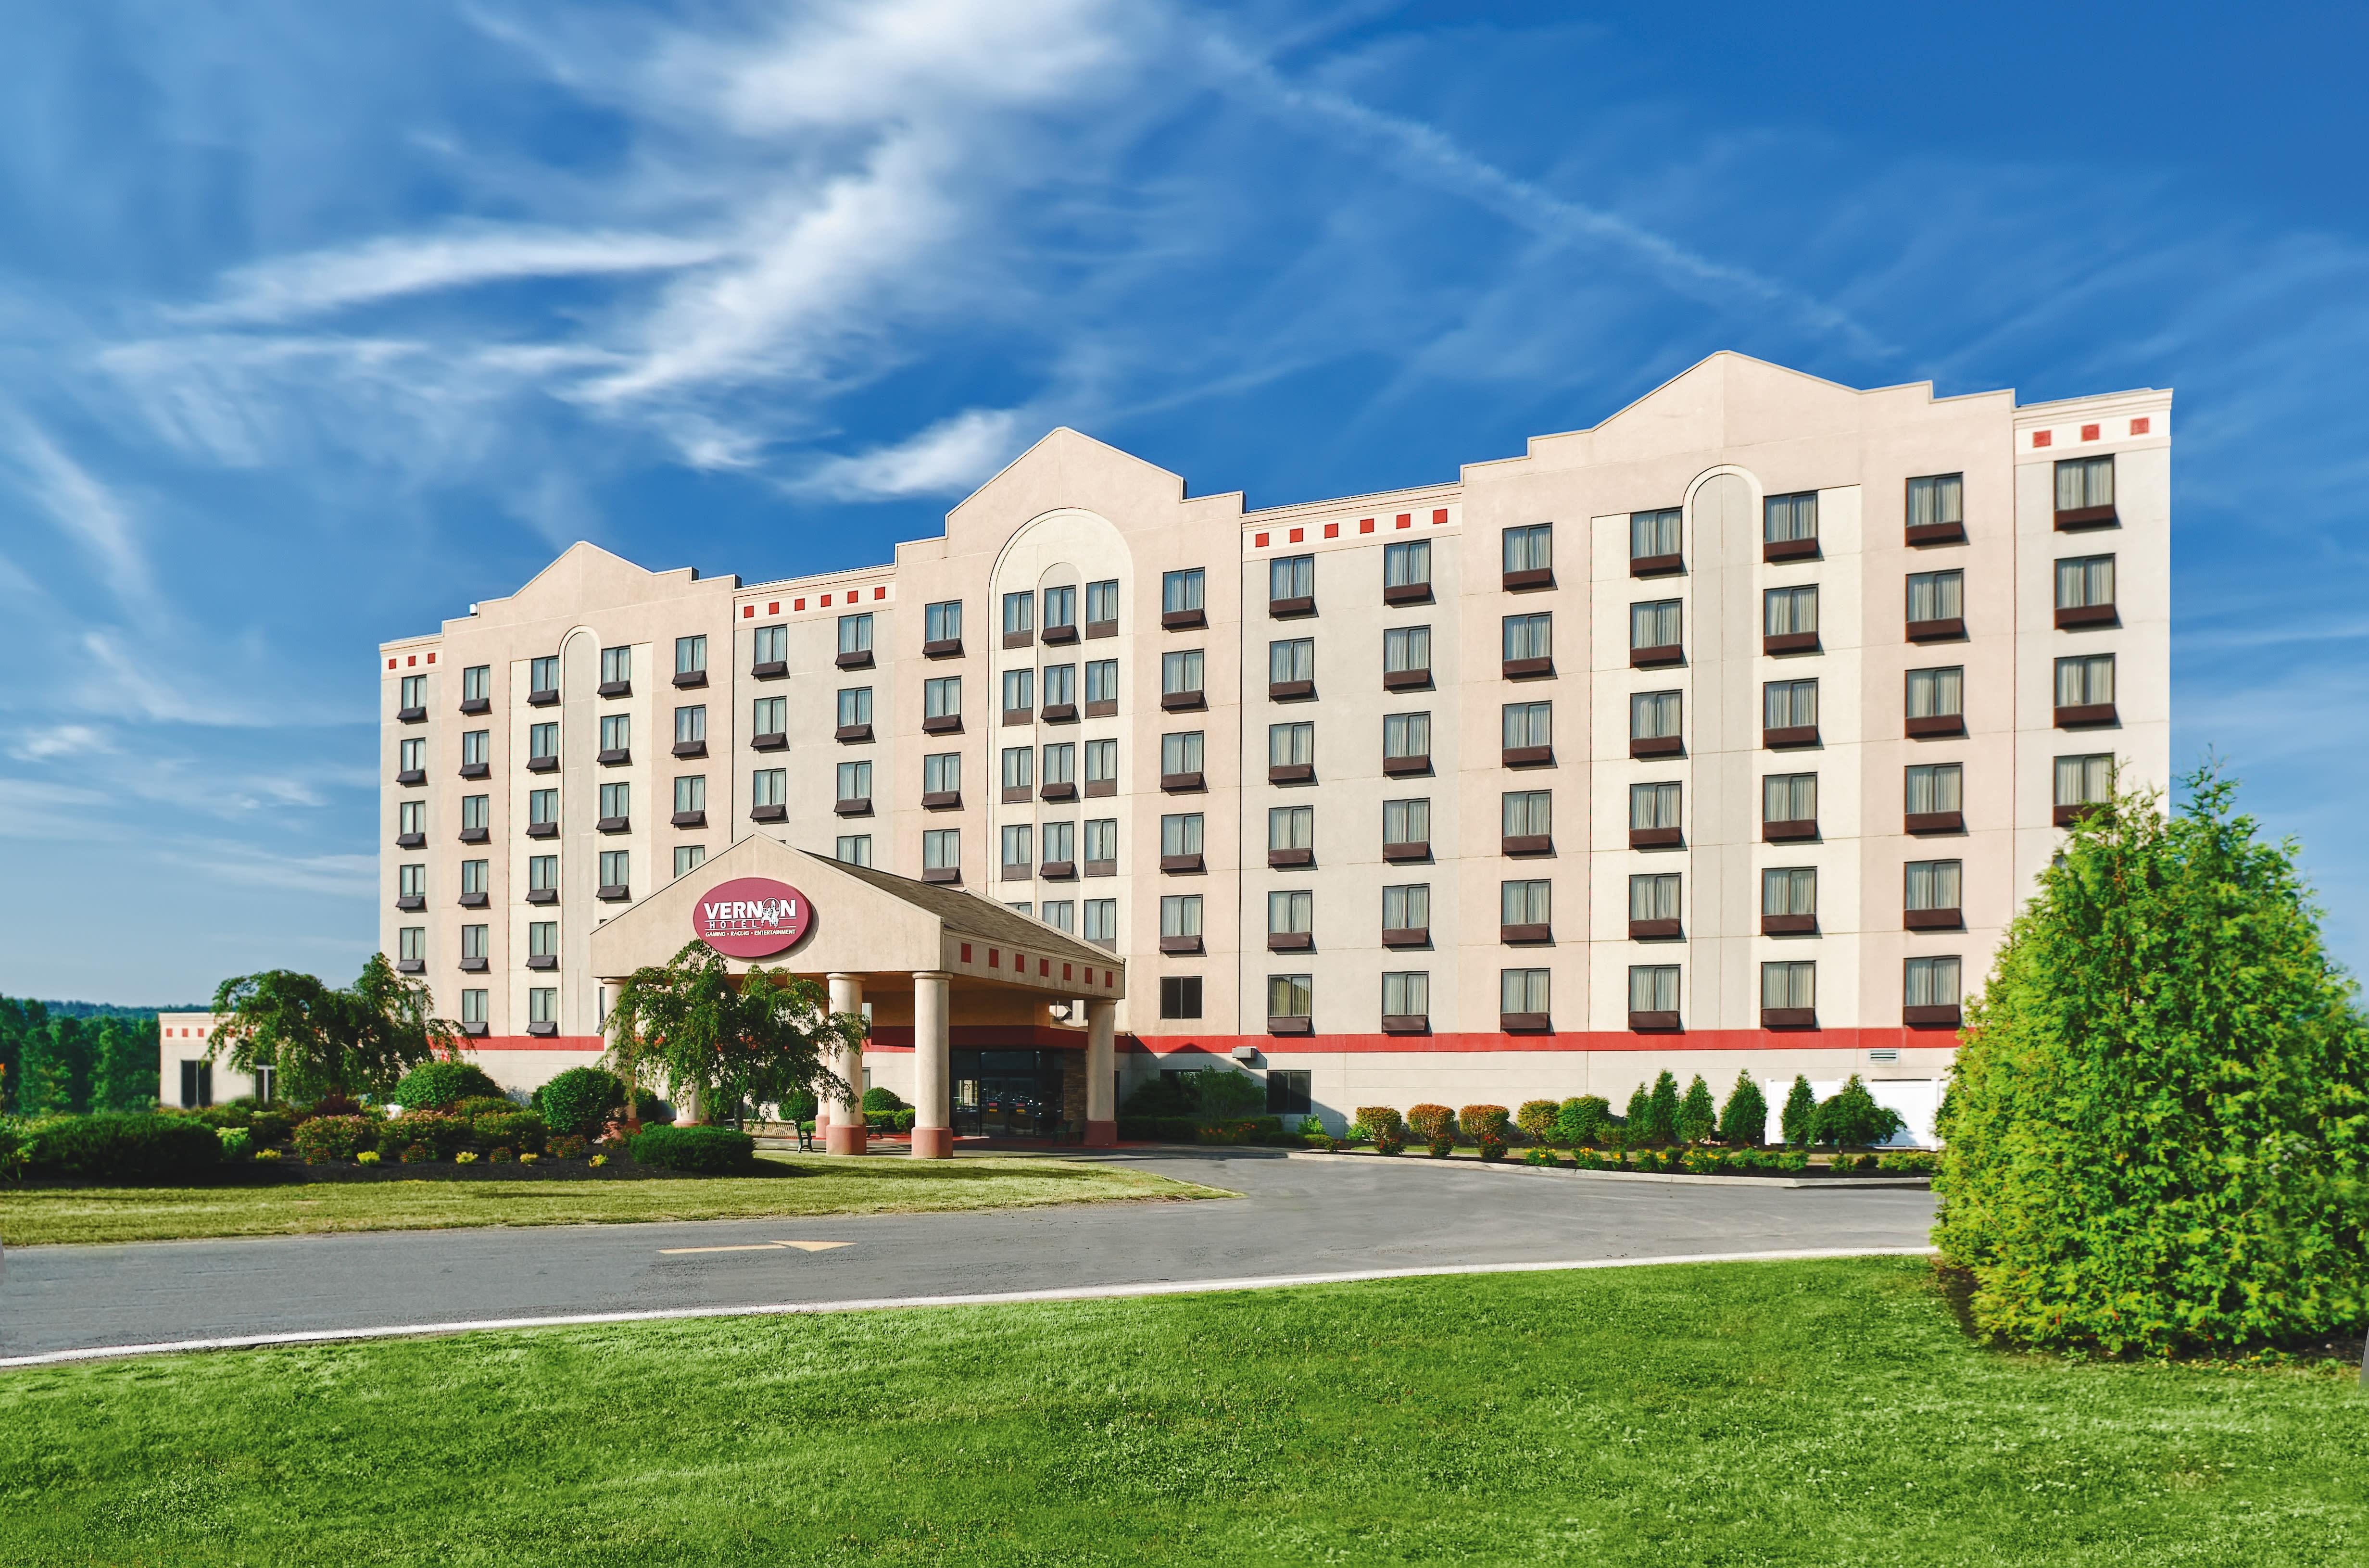 Vernon Casino Hotel